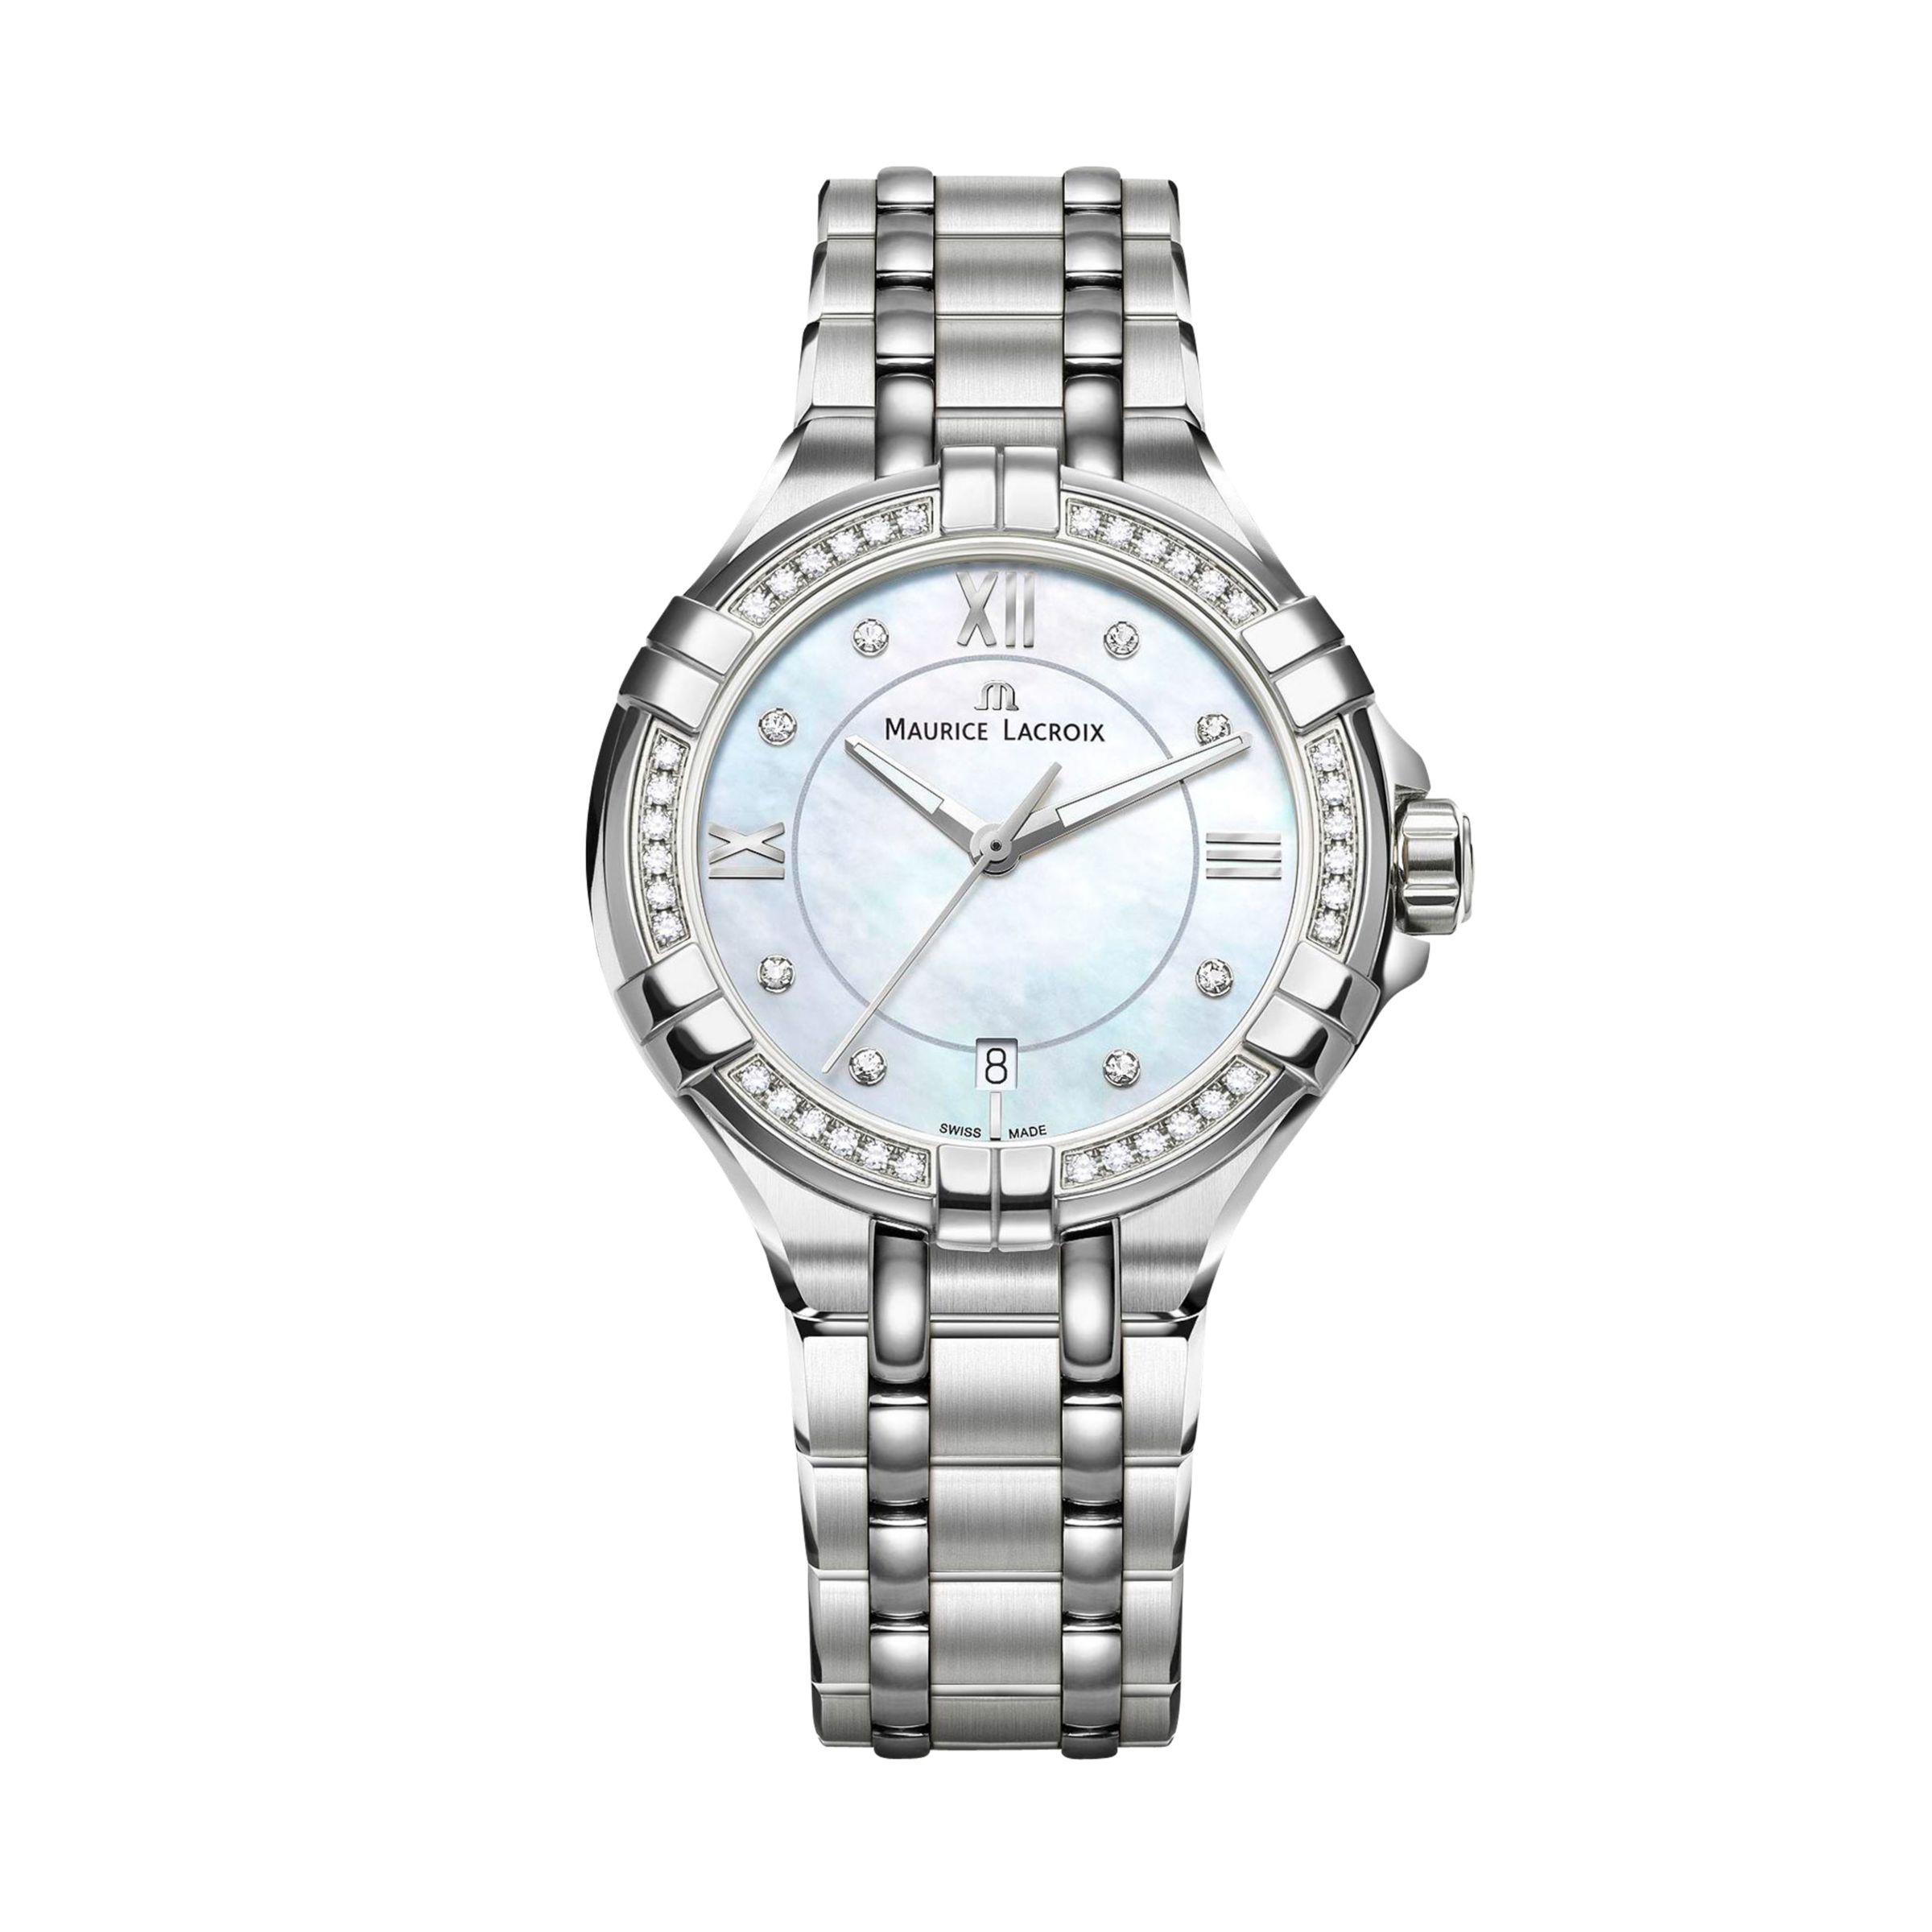 Maurice Lacroix Maurice Lacroix AI1006-SD502-170-1 Women's Aikon Diamond Date Bracelet Strap Watch, Silver/Mother of Pearl Blue